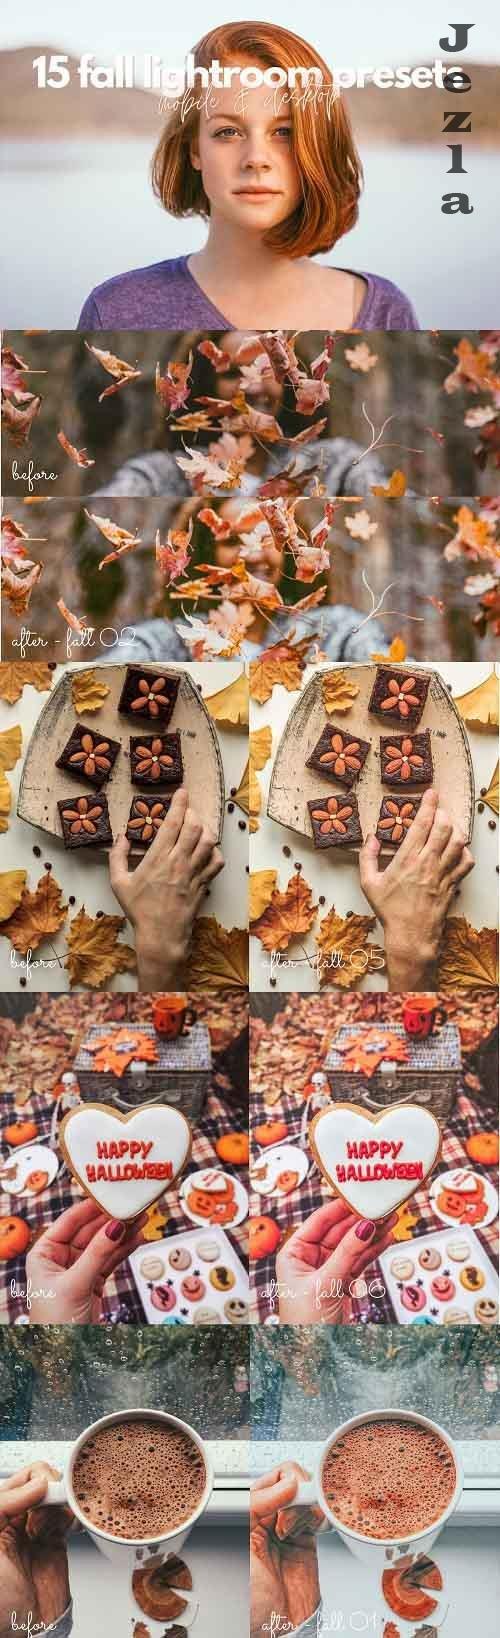 CreativeMarket - 15 Fall / Autumn Lightroom Presets 5499857